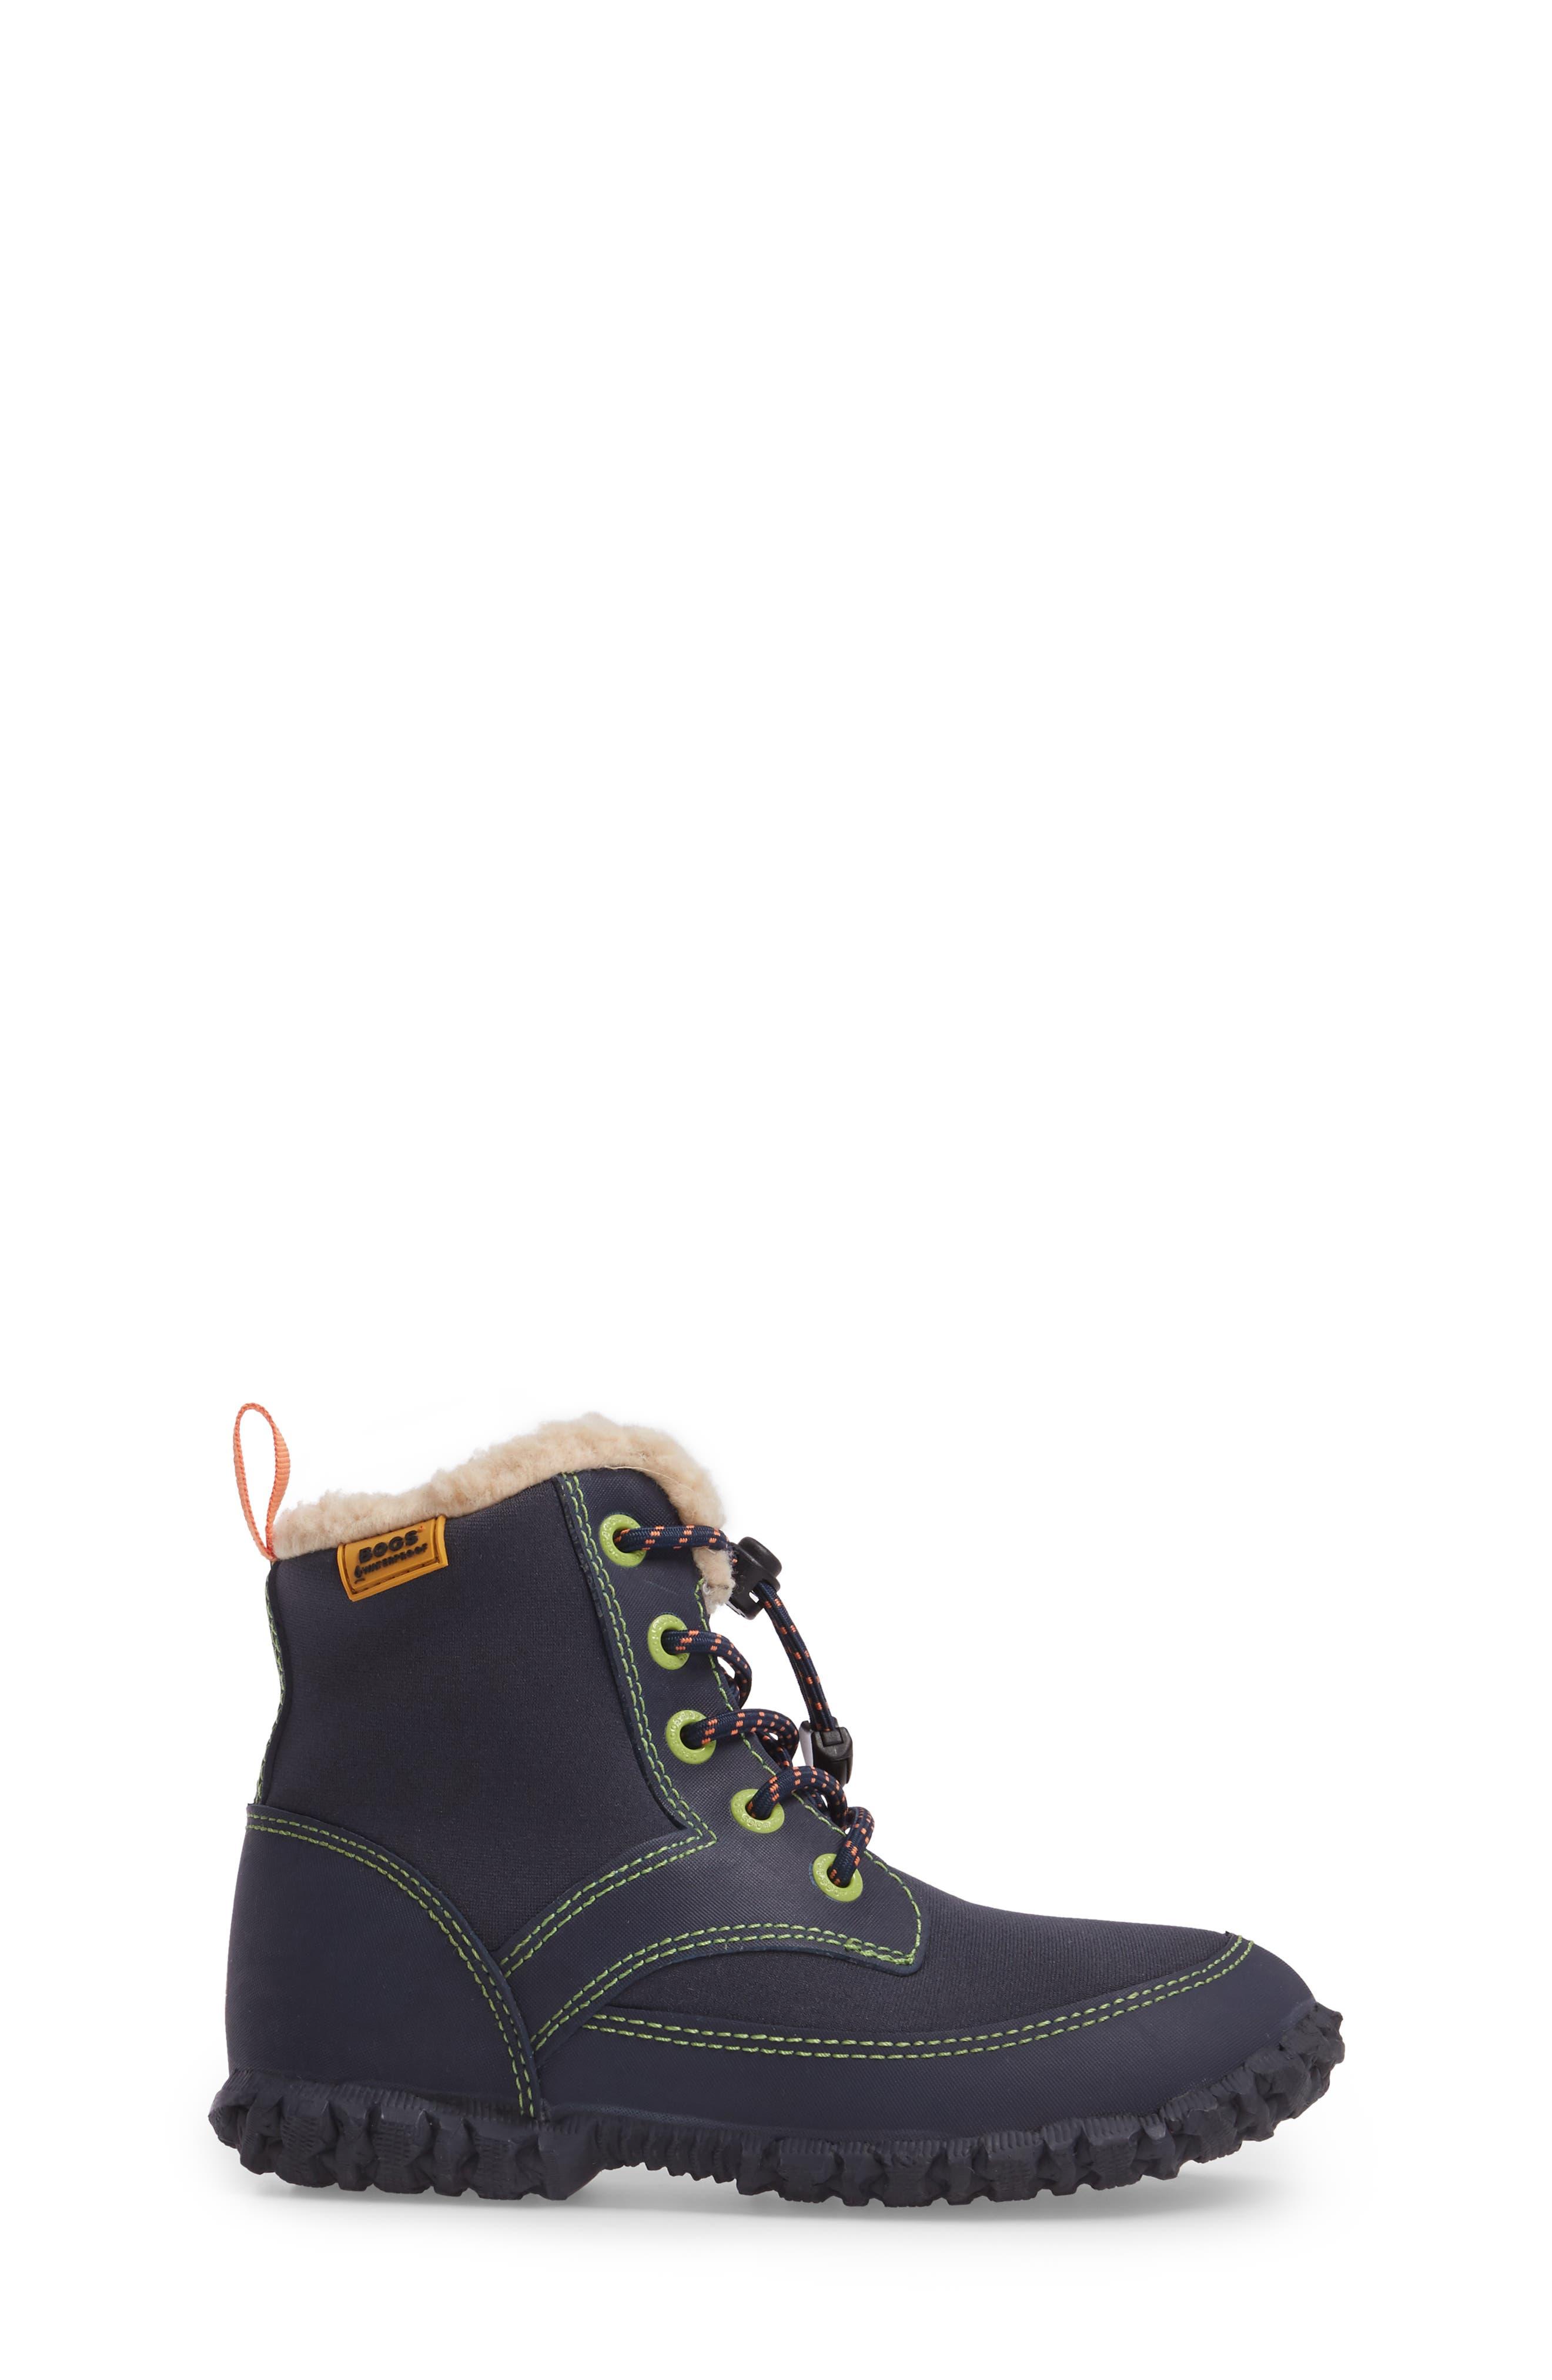 Skyler Faux Fur Insulated Waterproof Boot,                             Alternate thumbnail 8, color,